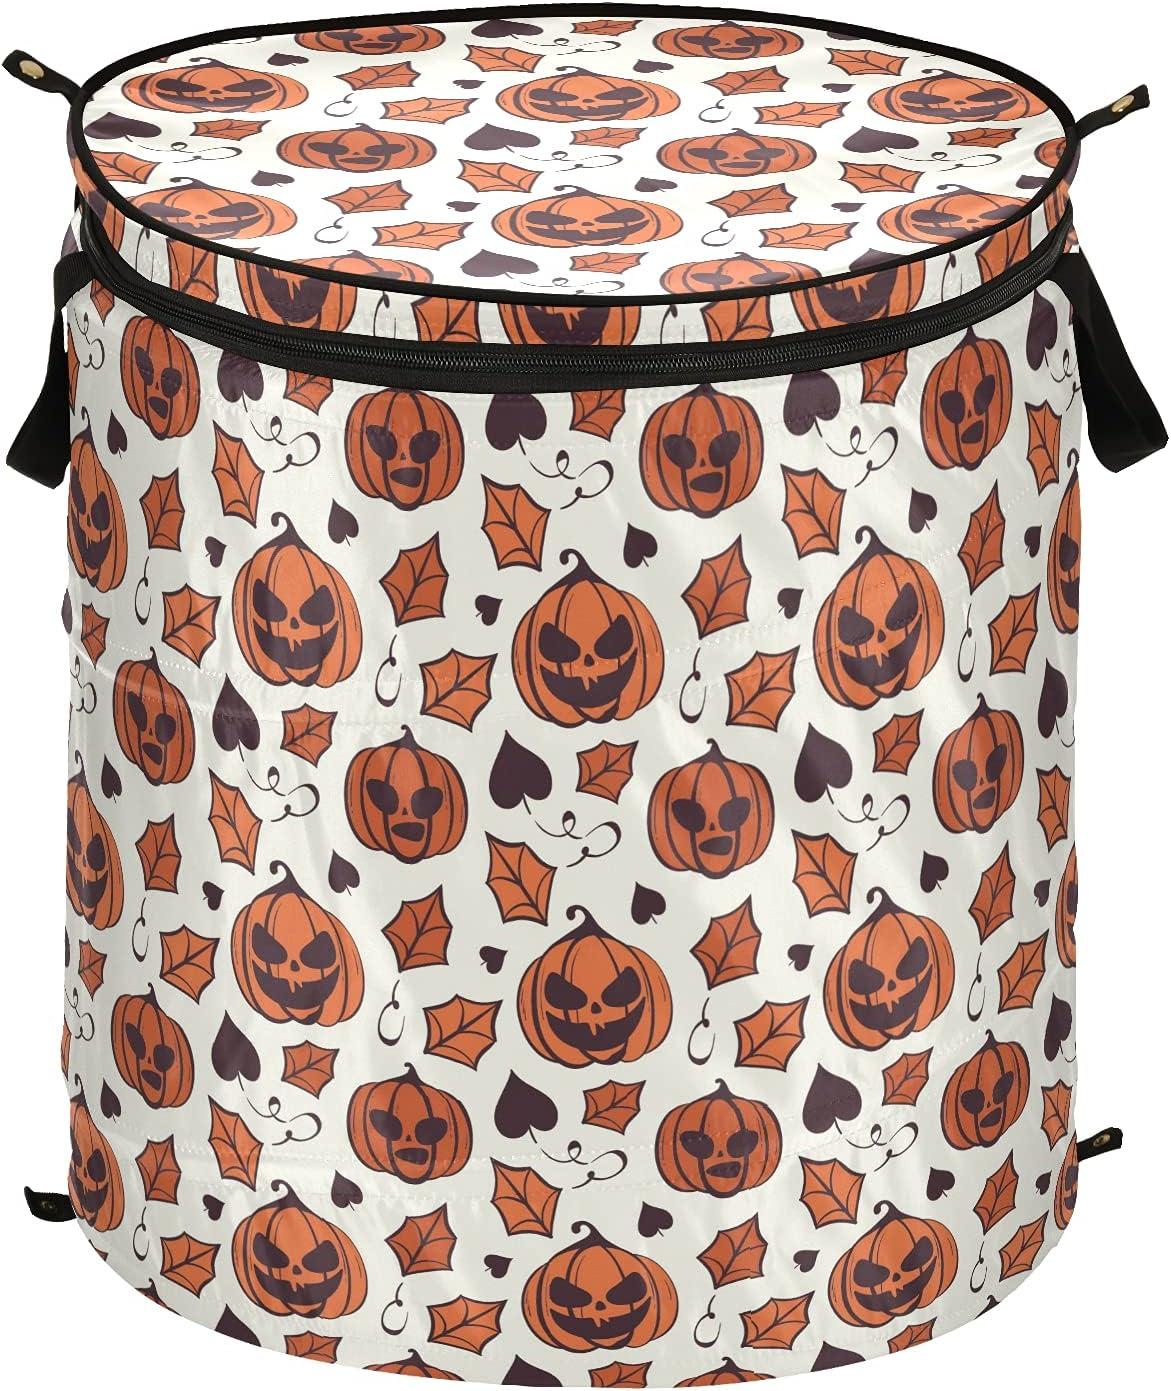 Pumkin Sales results No. 1 Leaf Happy Halloween Pop Up Folda with Tulsa Mall Laundry Lid Hamper